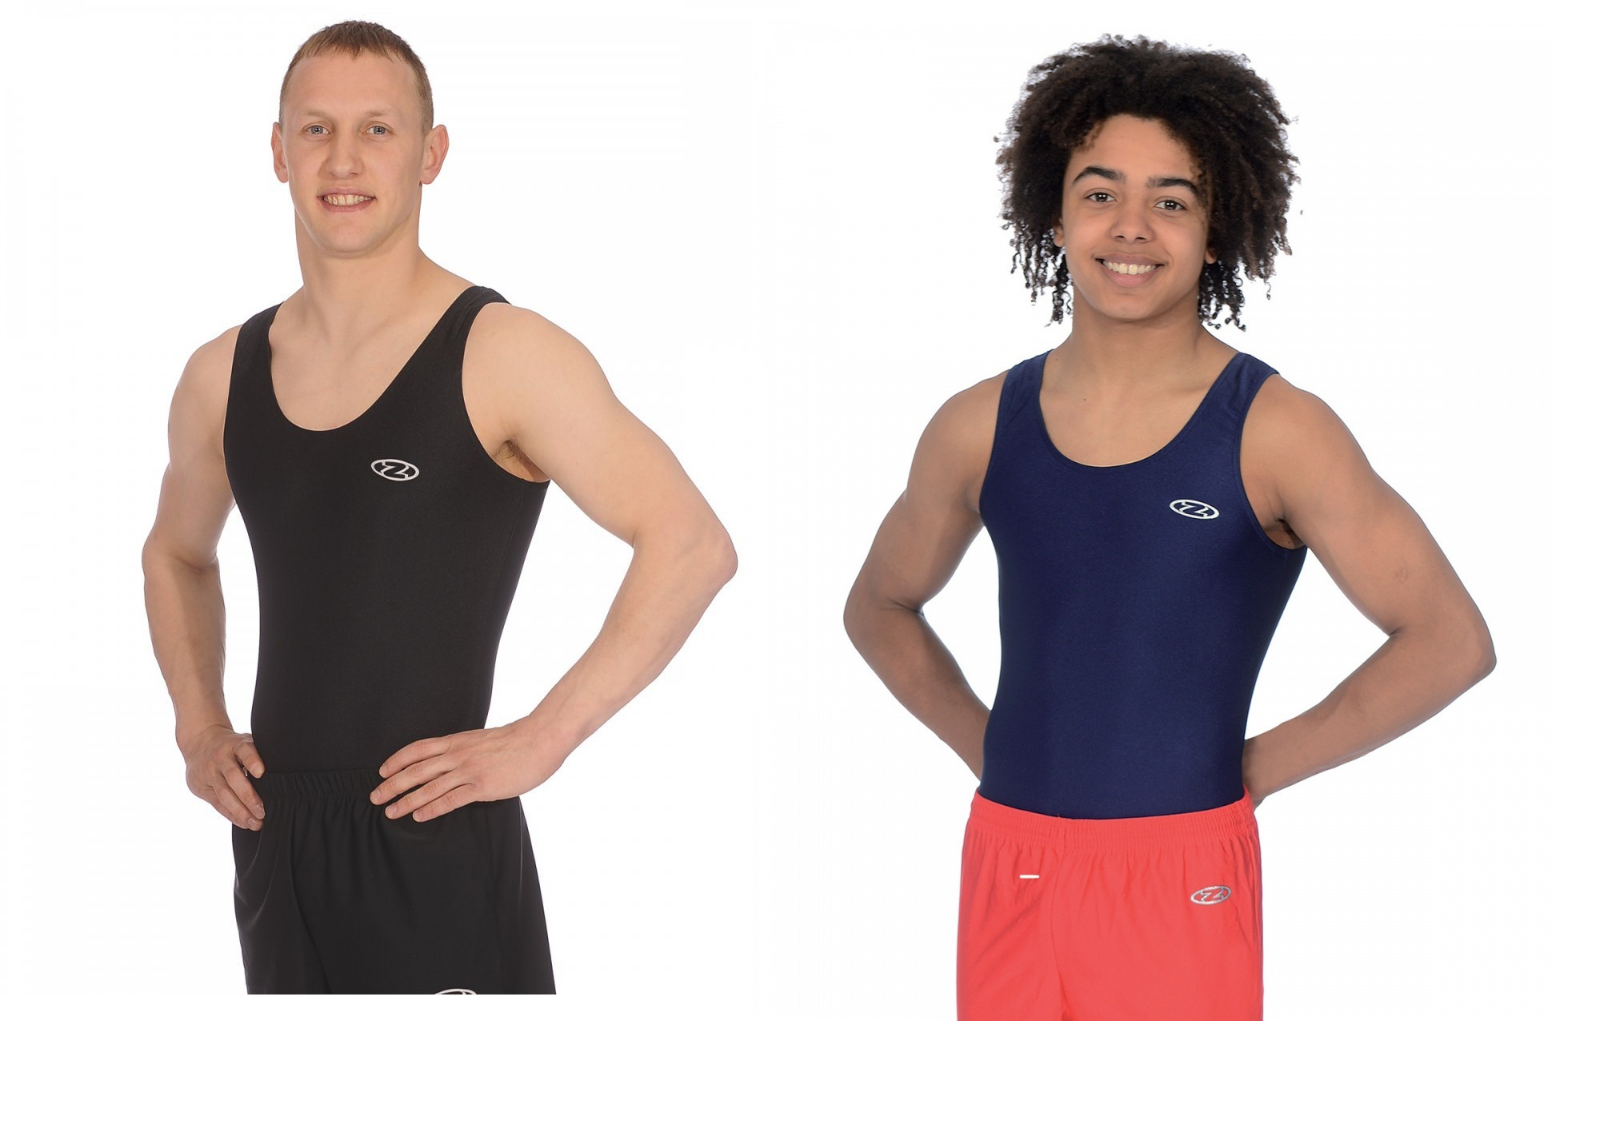 THE ZONE Z119 Mens and Boys Gymnastics Leotard Gym Gymnast Dance Black or Navy